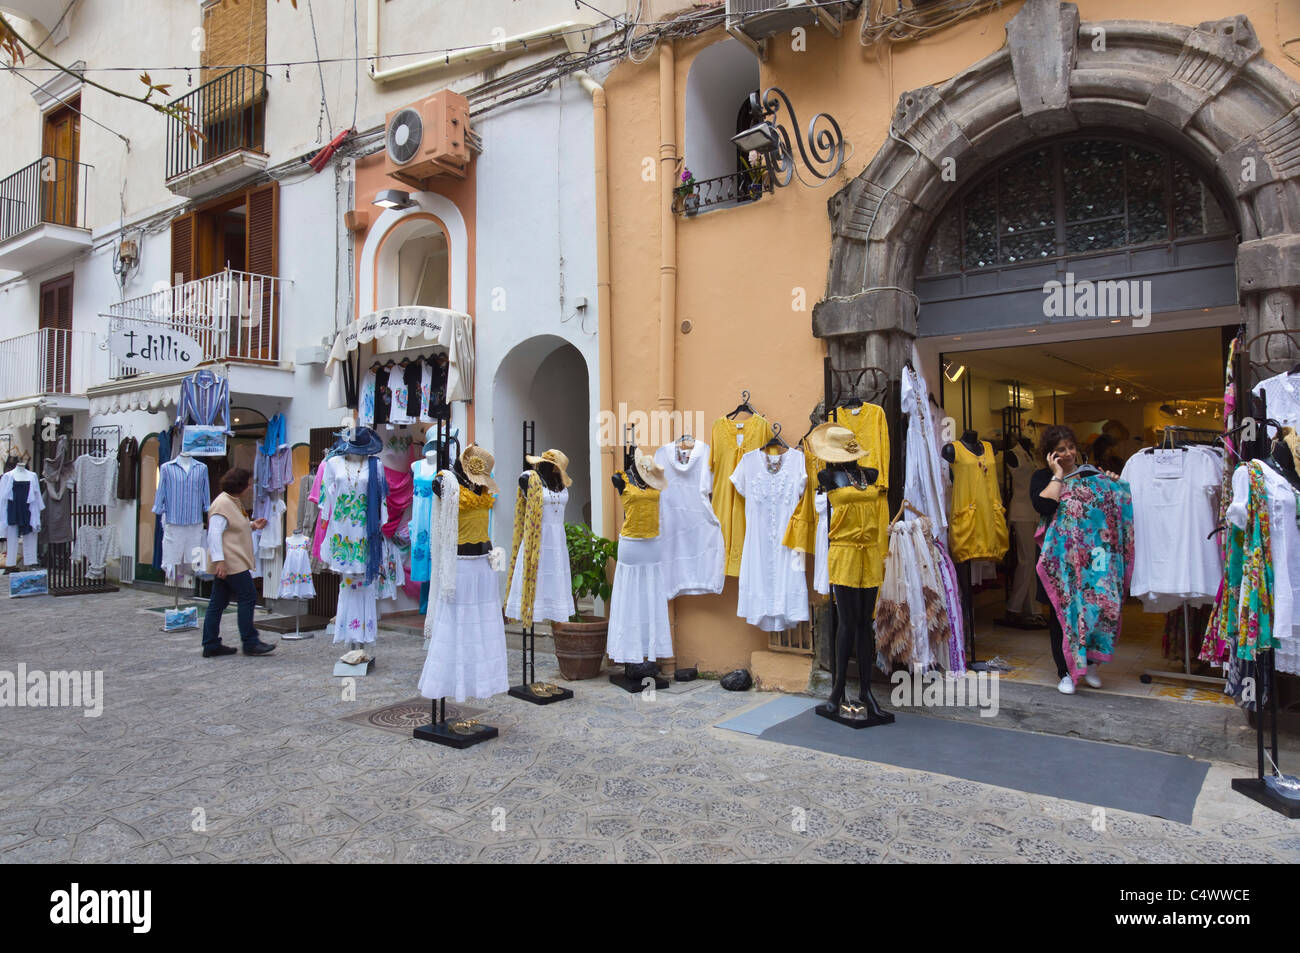 Italia - Positano. Tiendas de Moda fabricada localmente, famoso por vestidos de verano, 'moda Positano'. Imagen De Stock